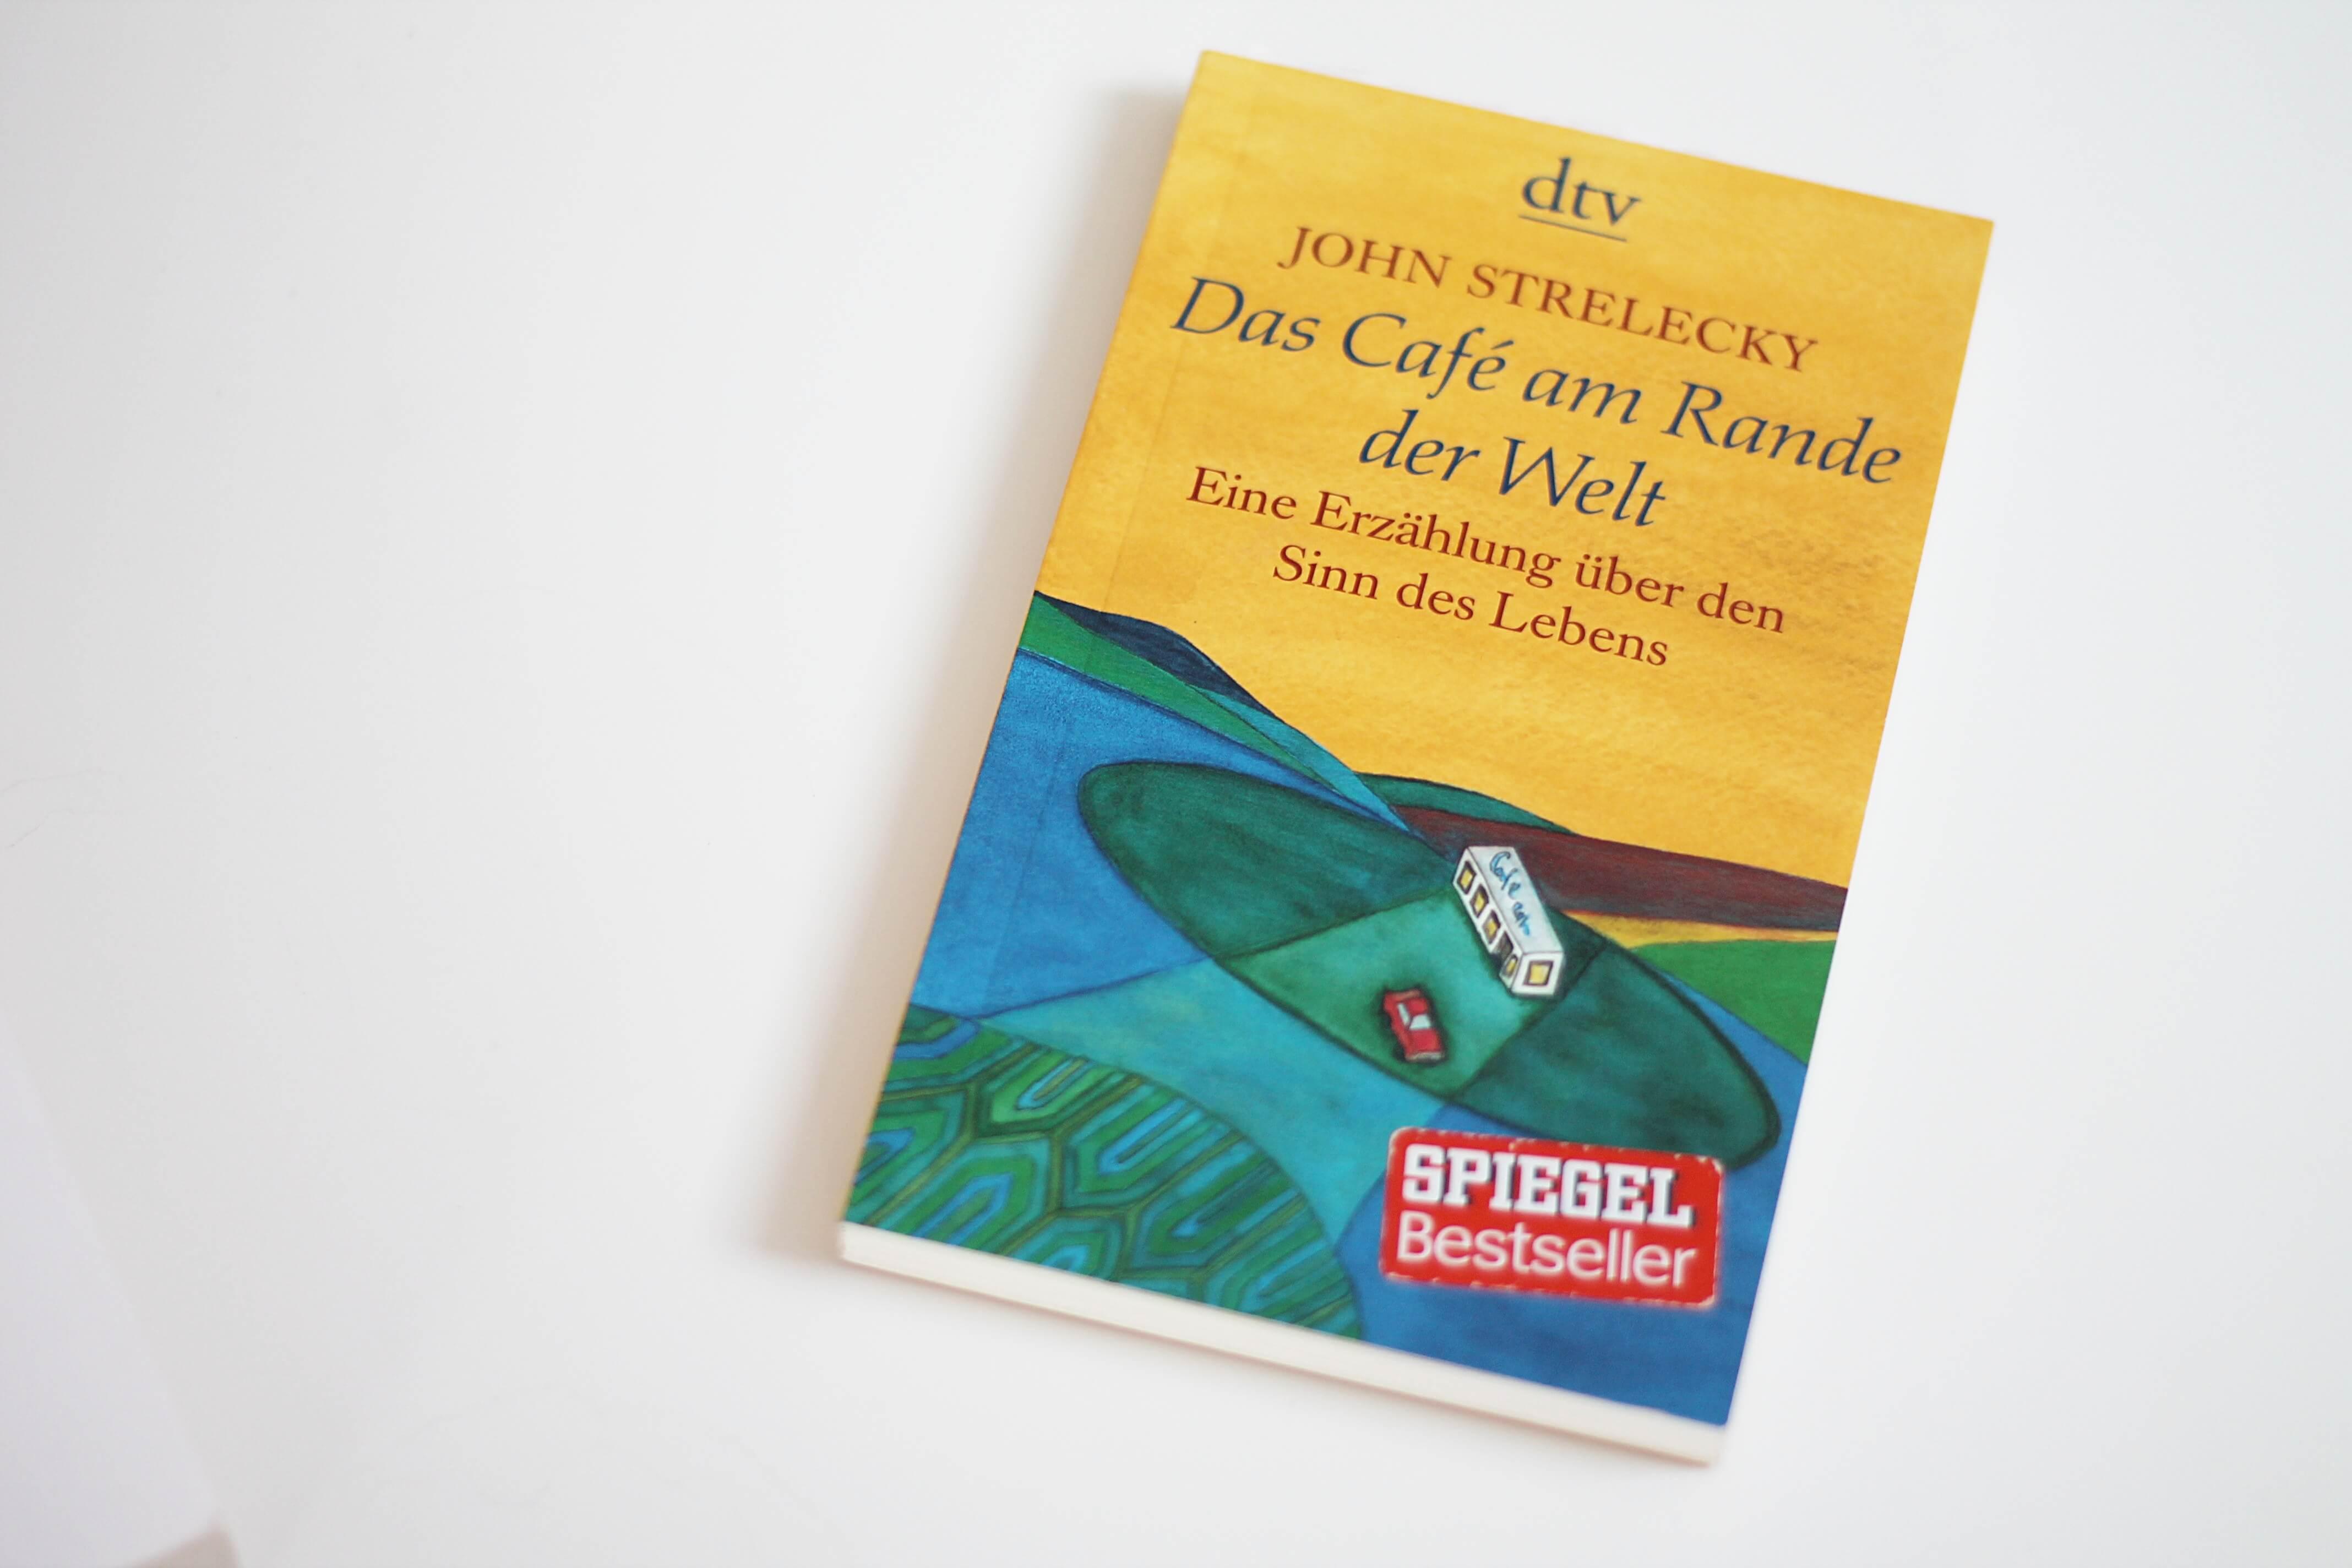 cafe-am-ende-der-welt-buchtipps